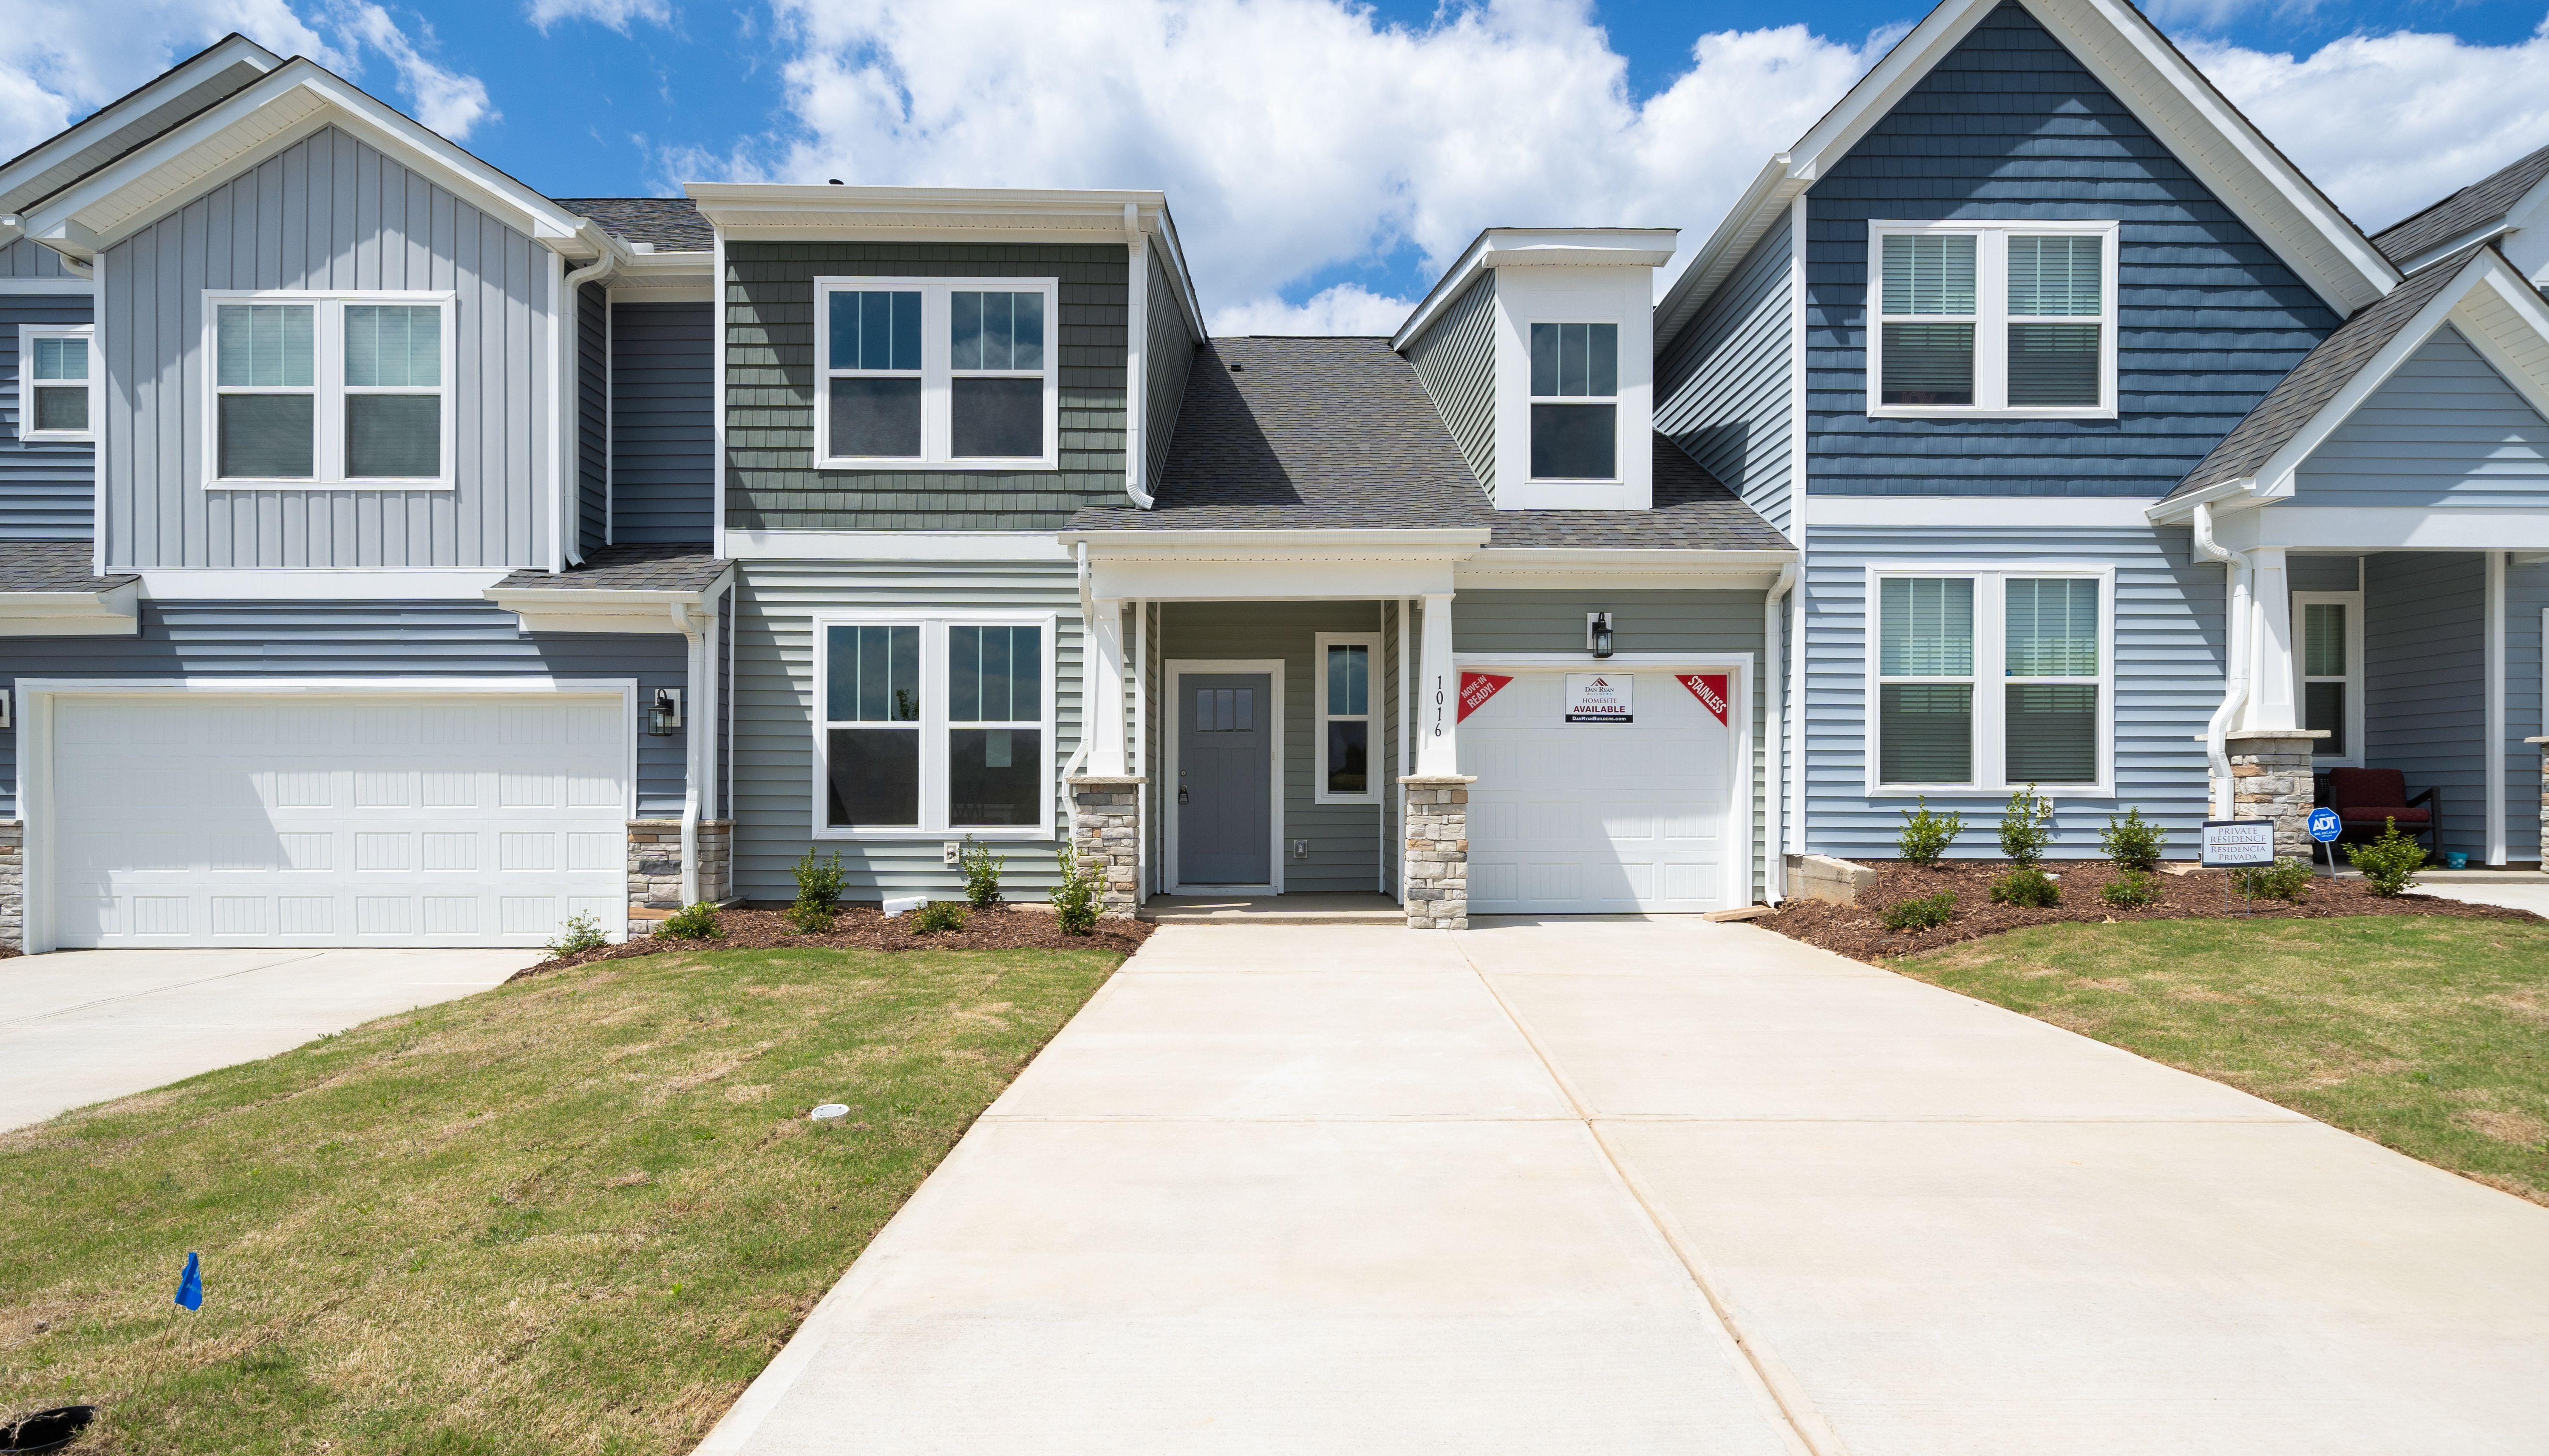 'Peachtree Townes' by Dan Ryan - Greenville Region in Greenville-Spartanburg